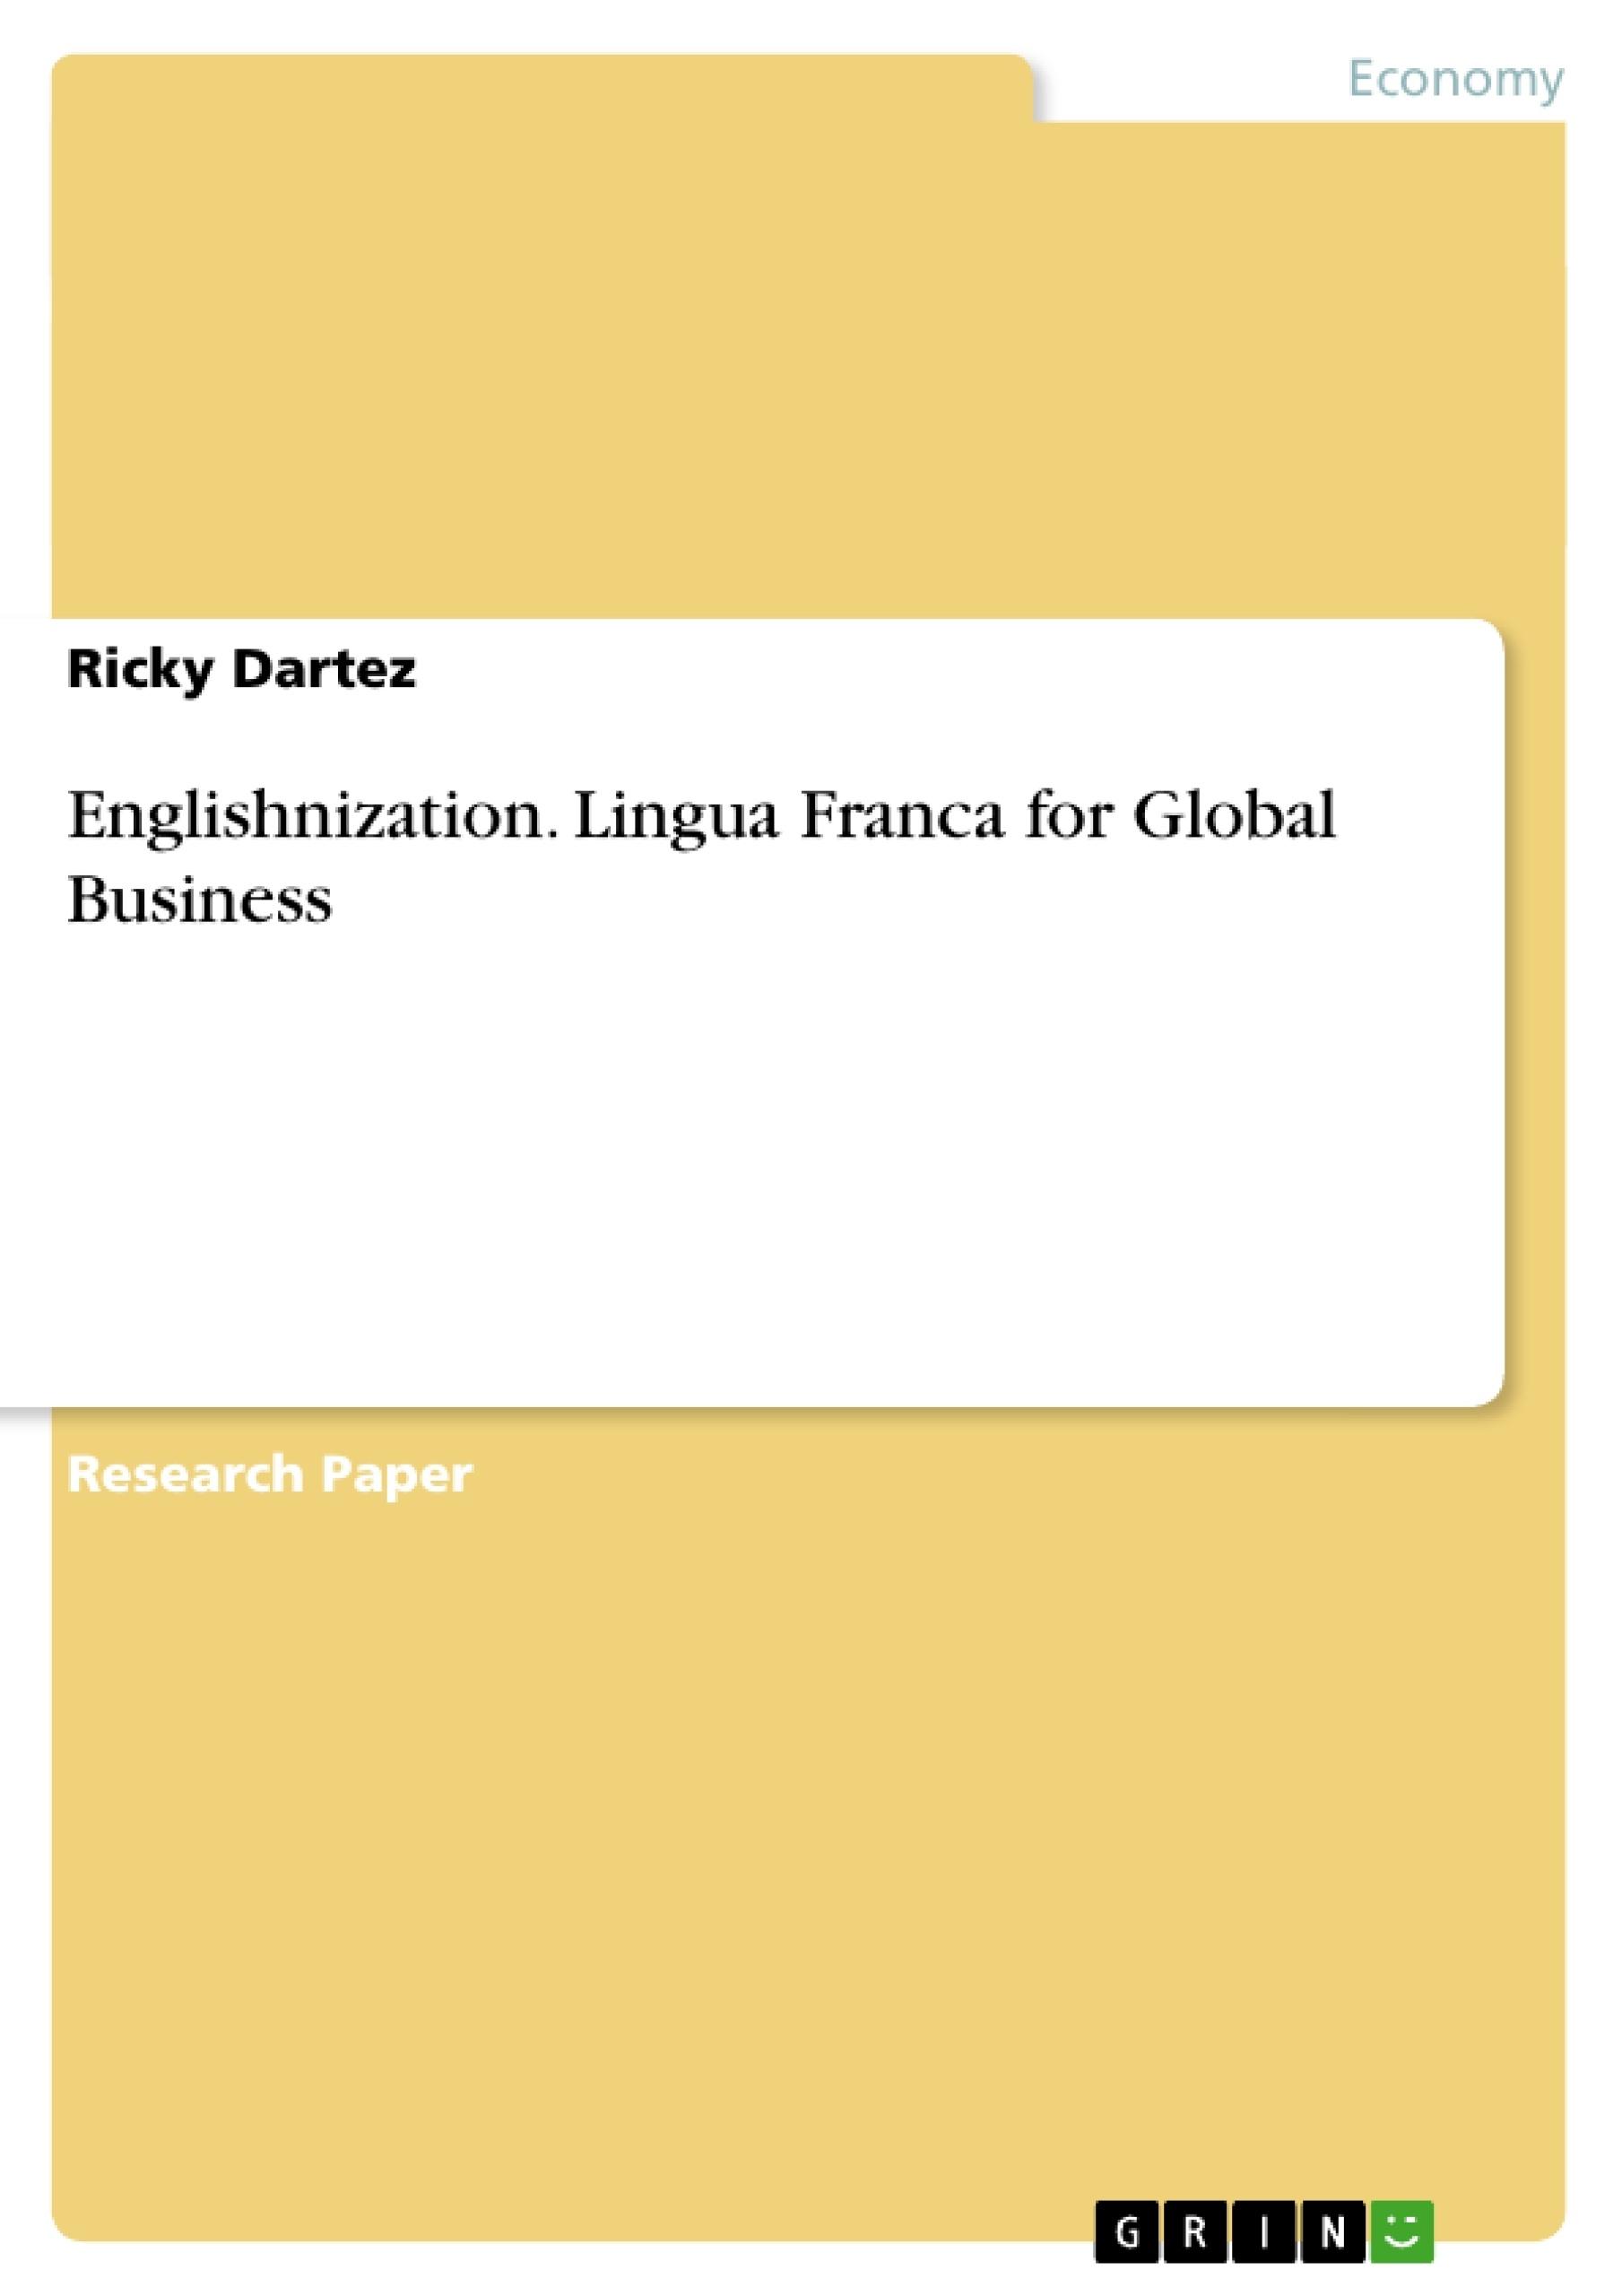 Title: Englishnization. Lingua Franca for Global Business